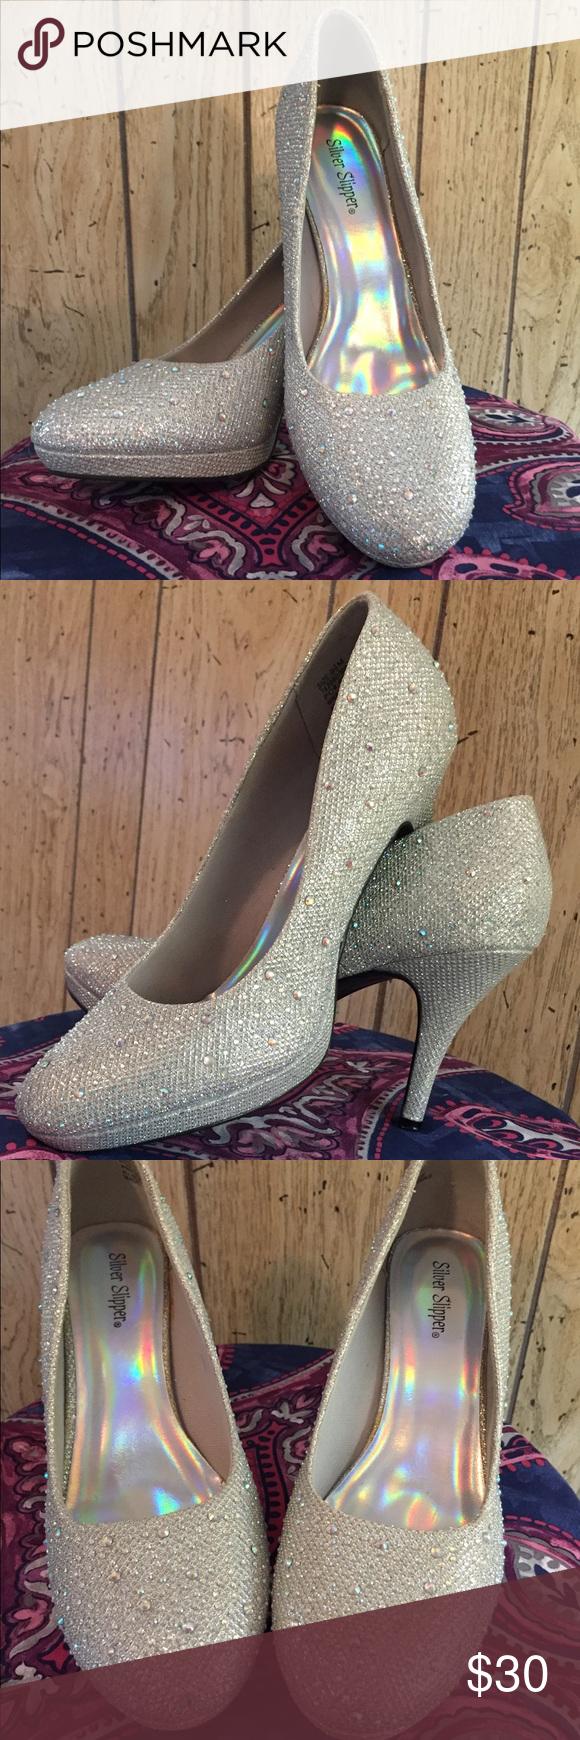 b58b1aa4a26 Silver slipper sparkly high heels Silver slipper sparkly high heels Size 9  1 2 Only